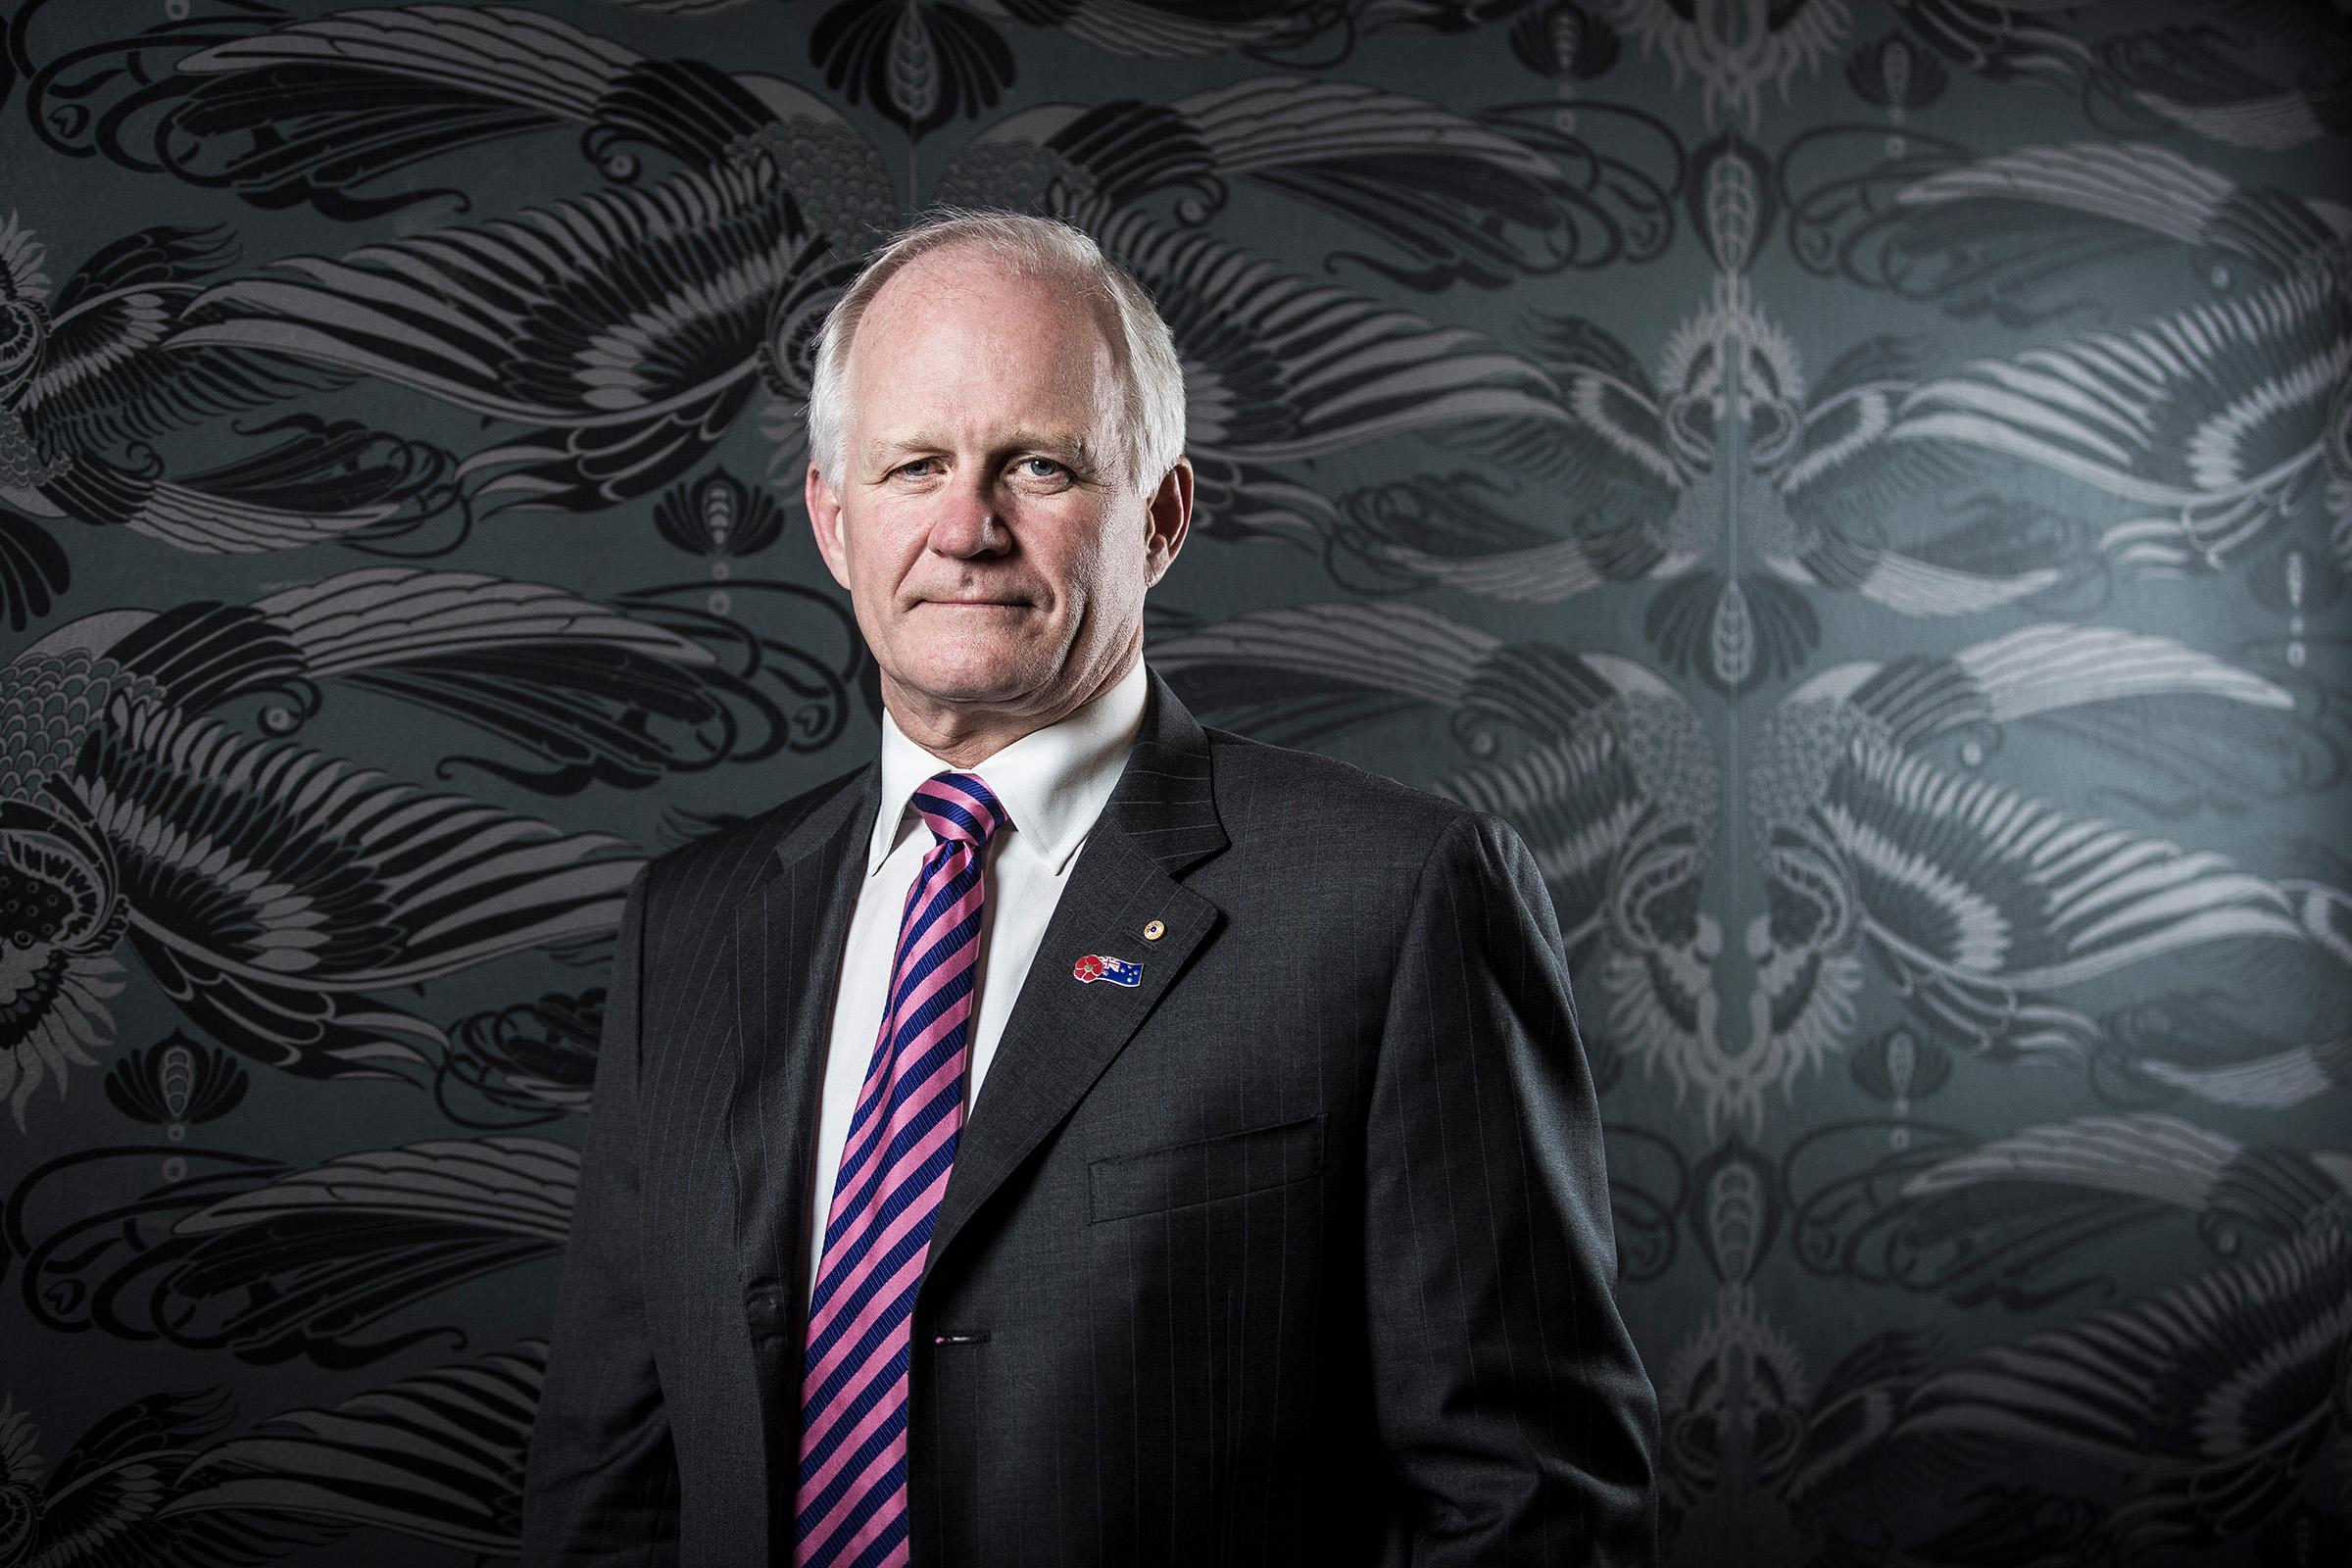 Corporate editorial location Chairman portrait photography Michael Hawker Macquarie Group business attire